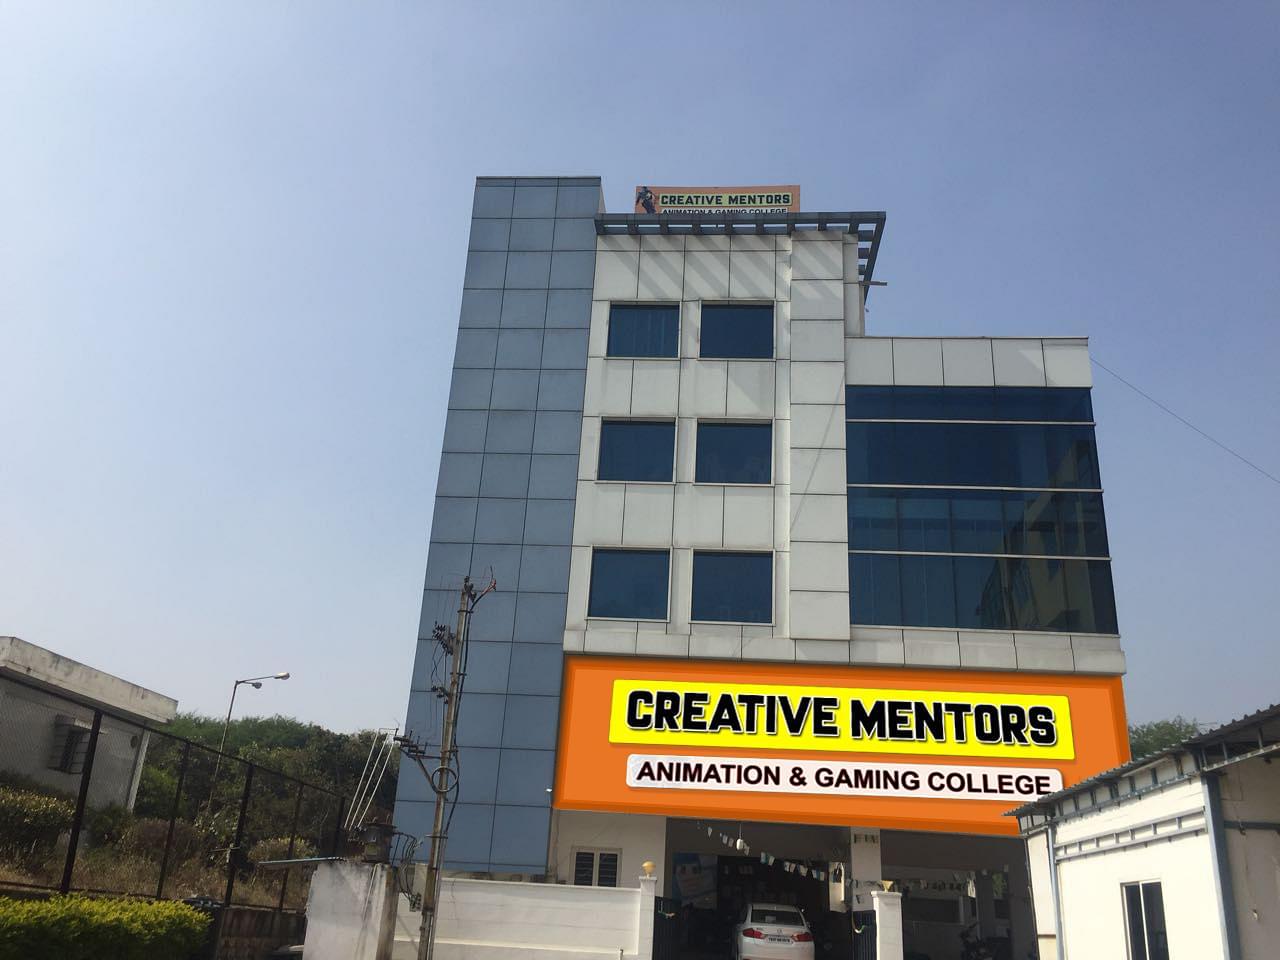 Prasad's Creative Mentors Film & Media School